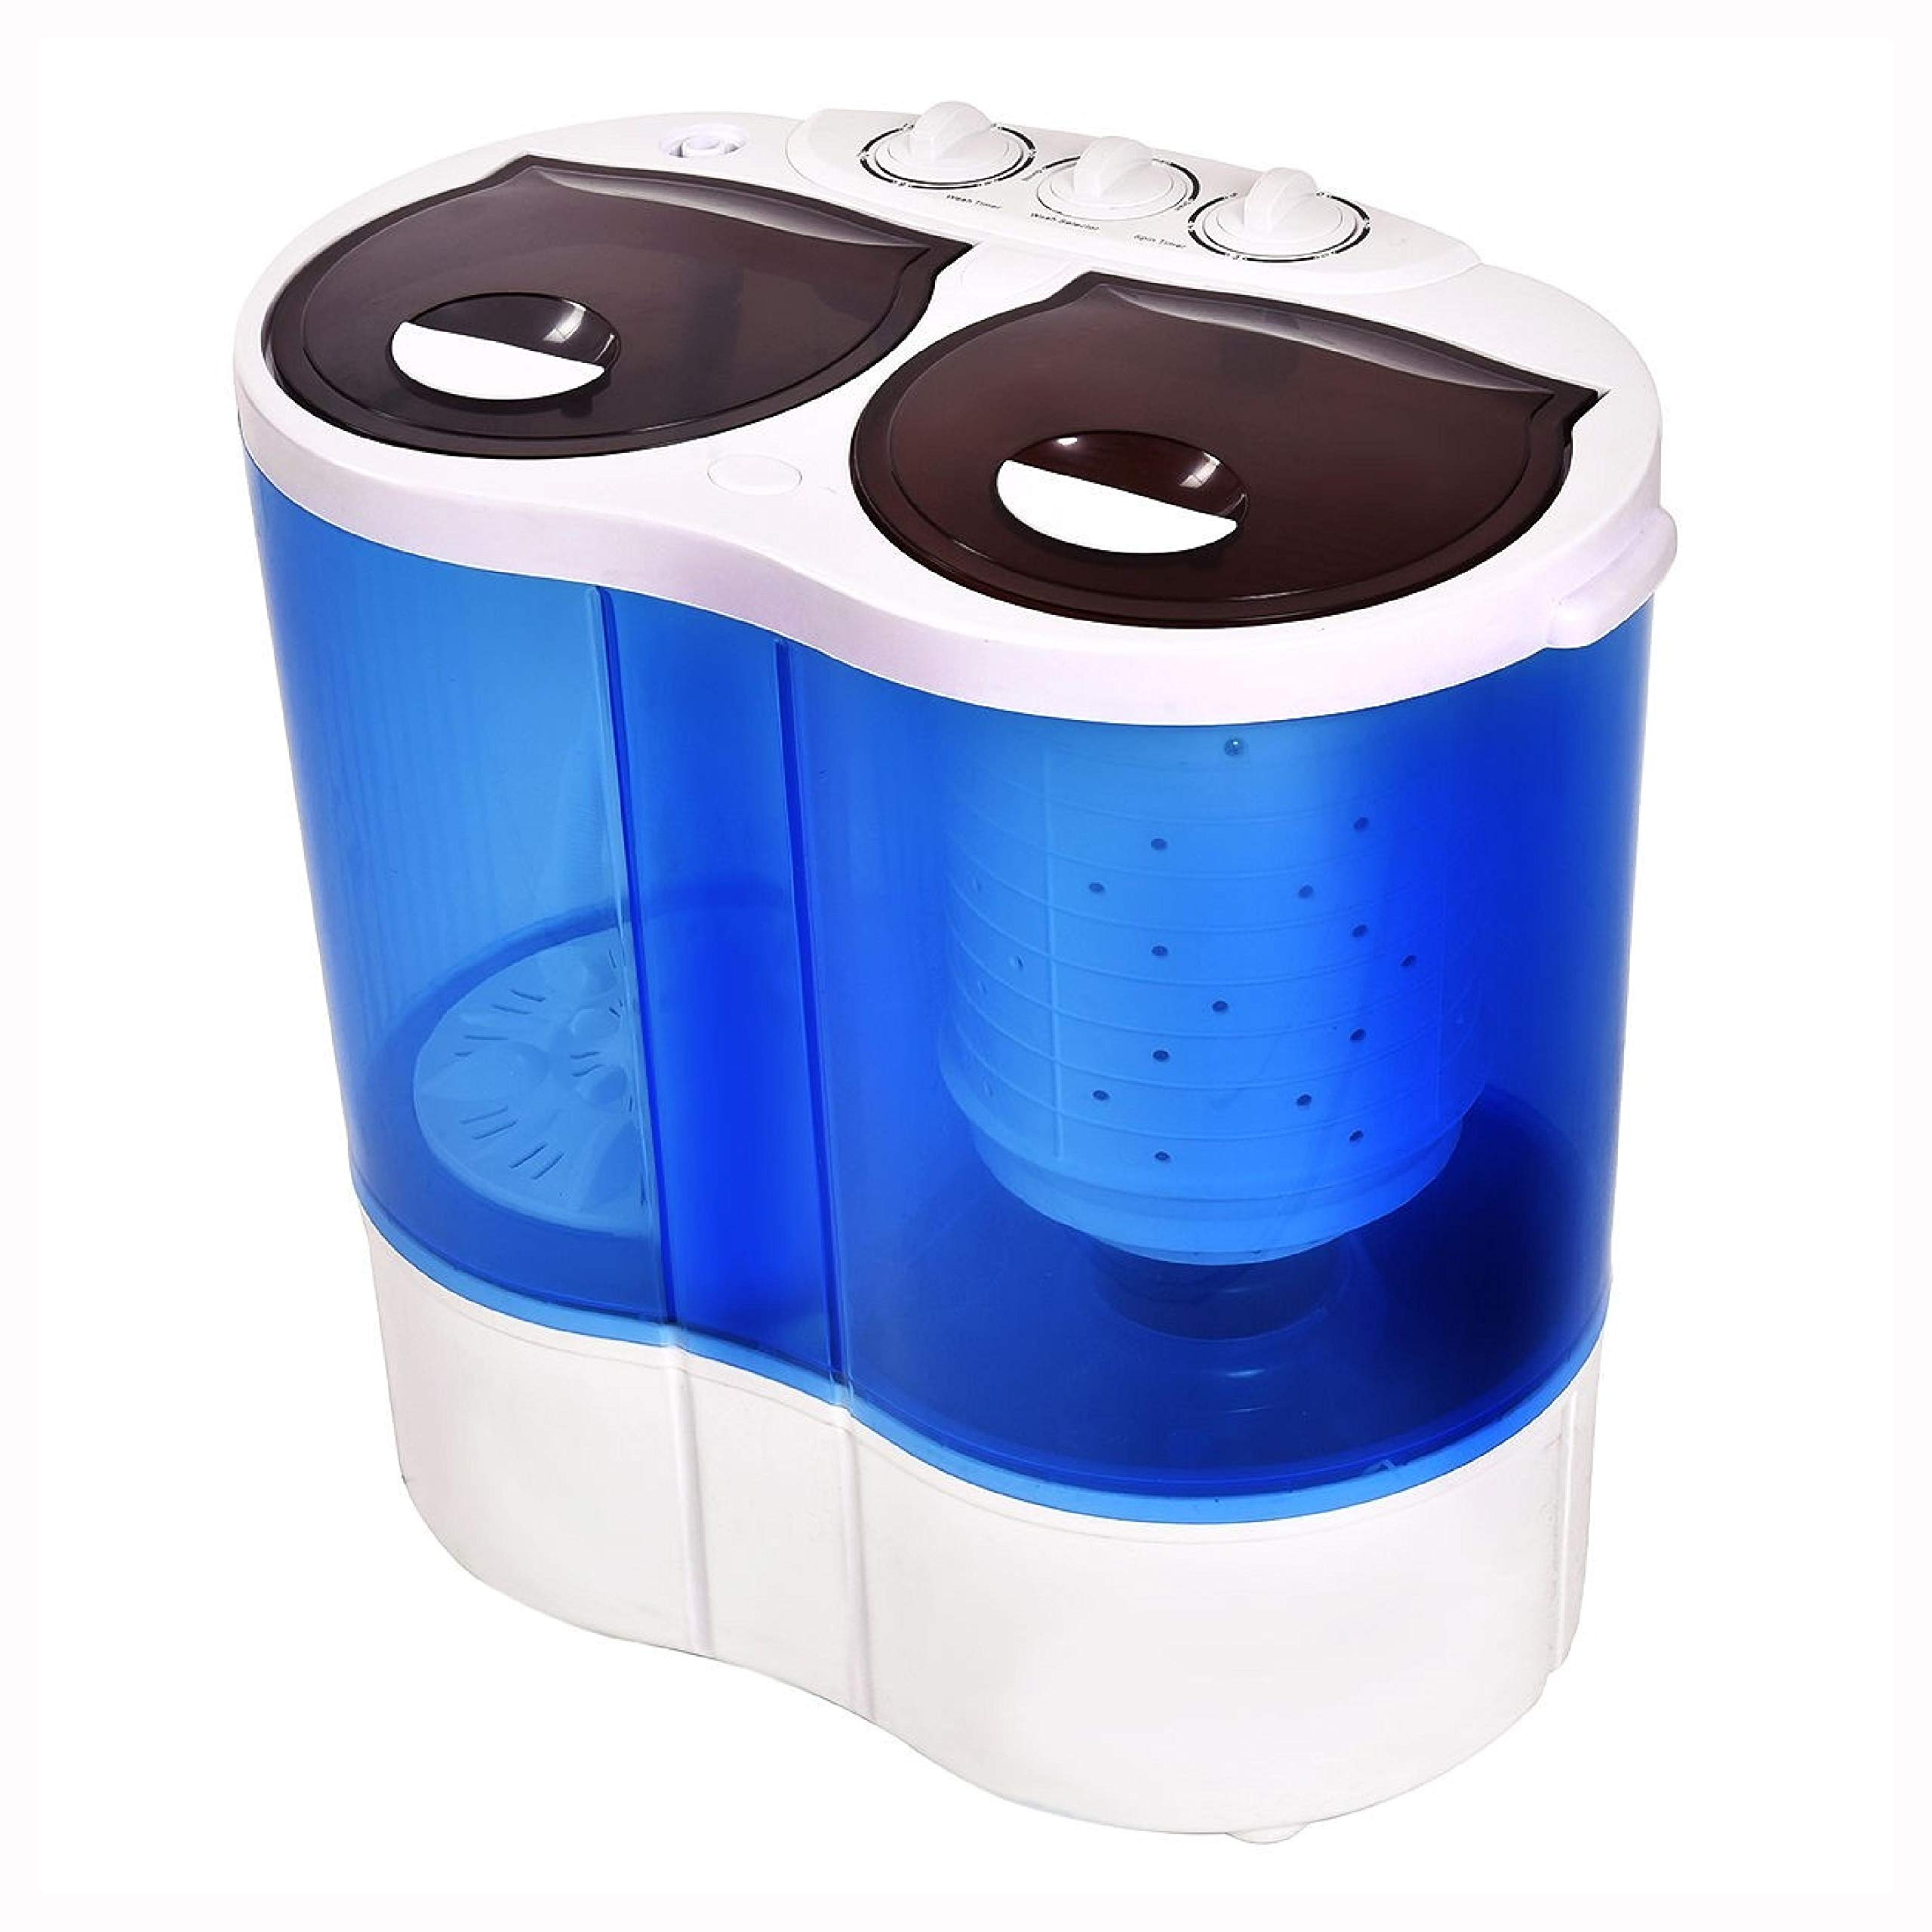 Washing Machine, 15 lbs Portable Compact Twin Tub Mini Washing Machine by HomyDelight (Image #6)